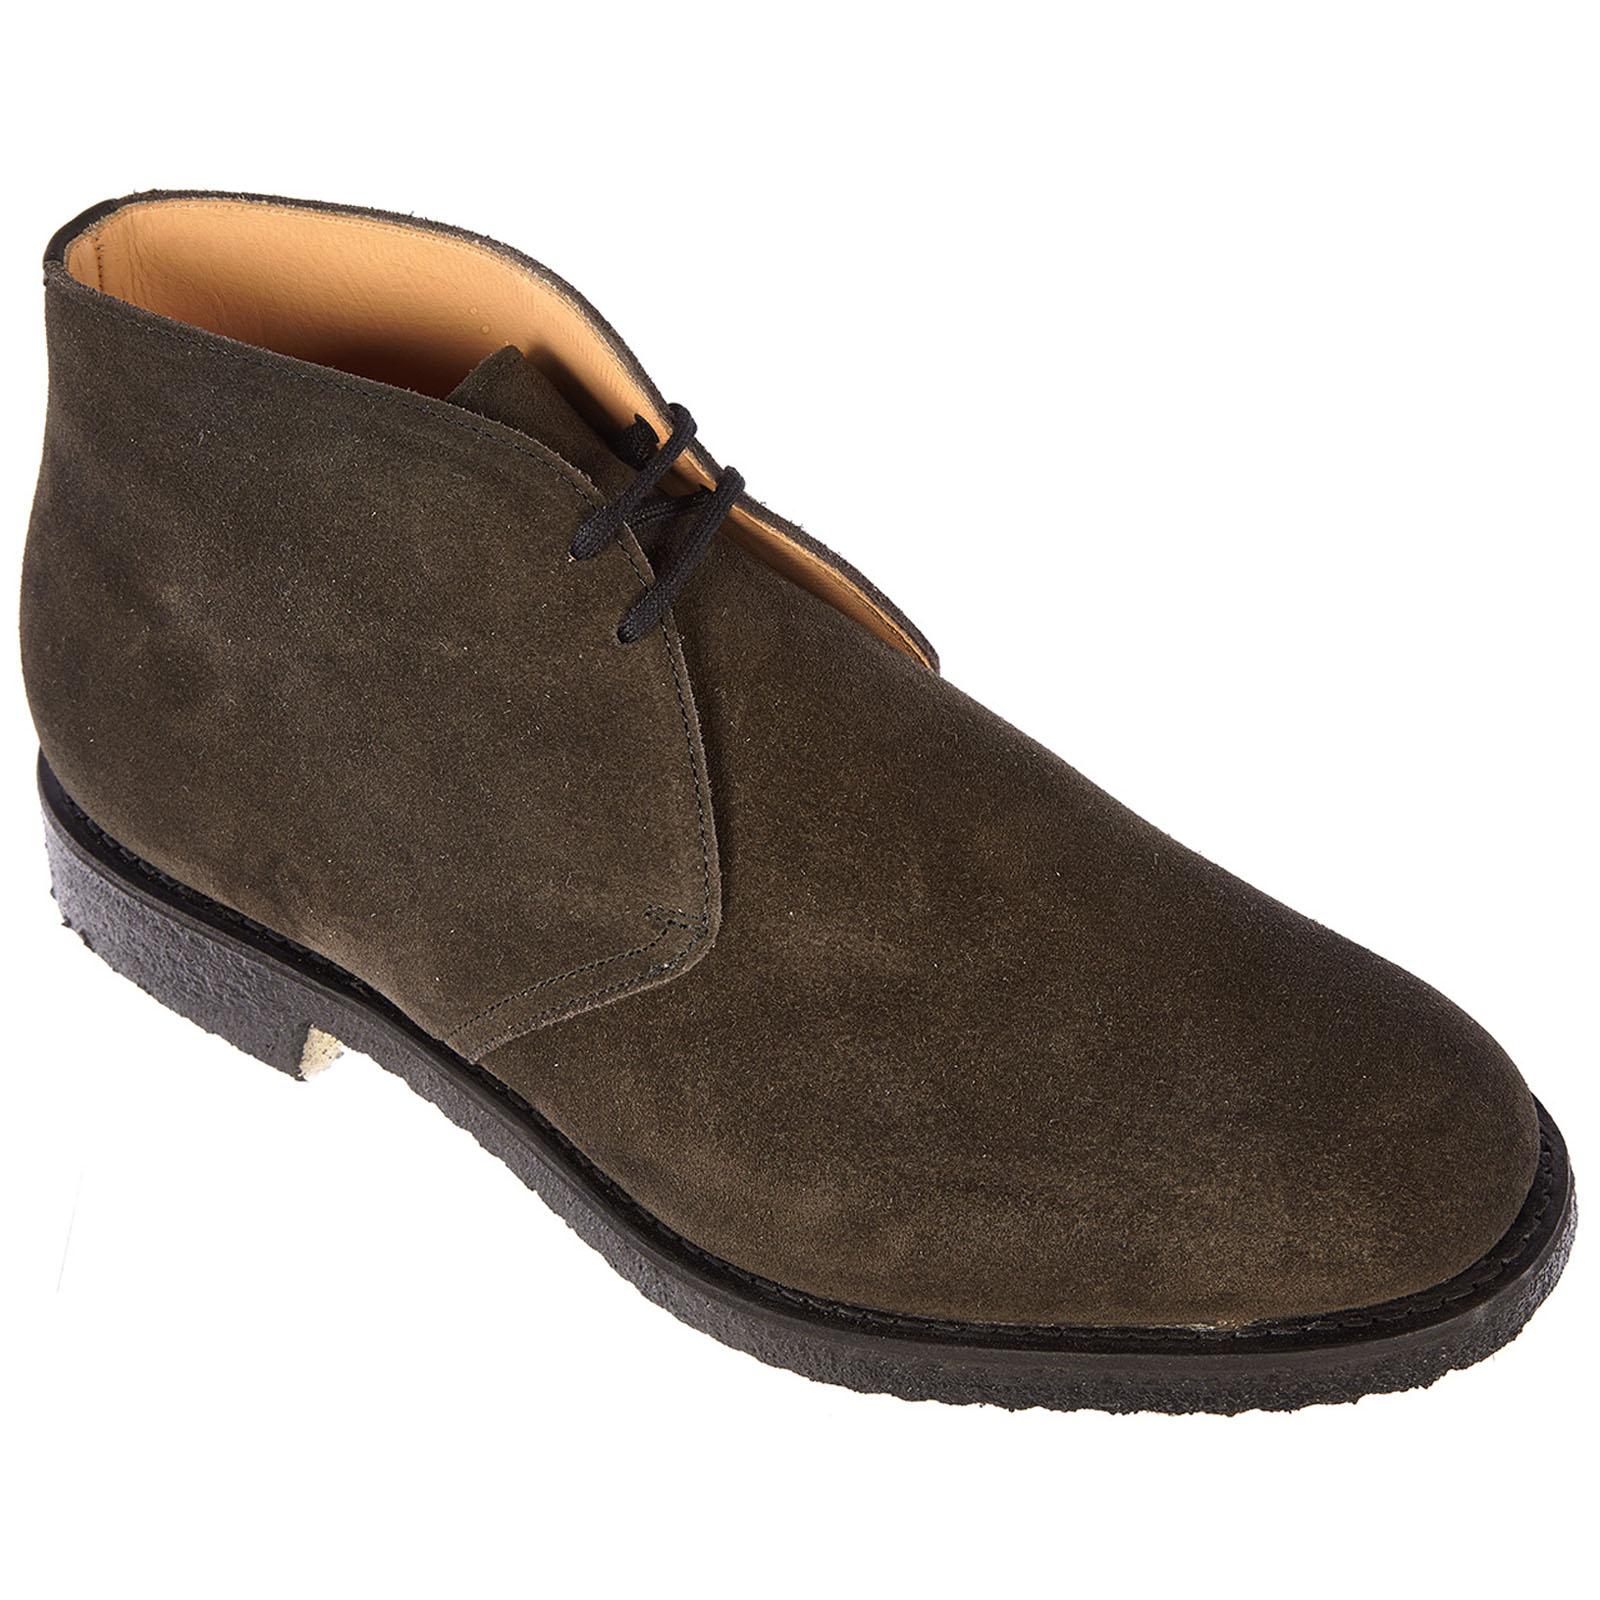 Botines zapatos en ante hombres ryder